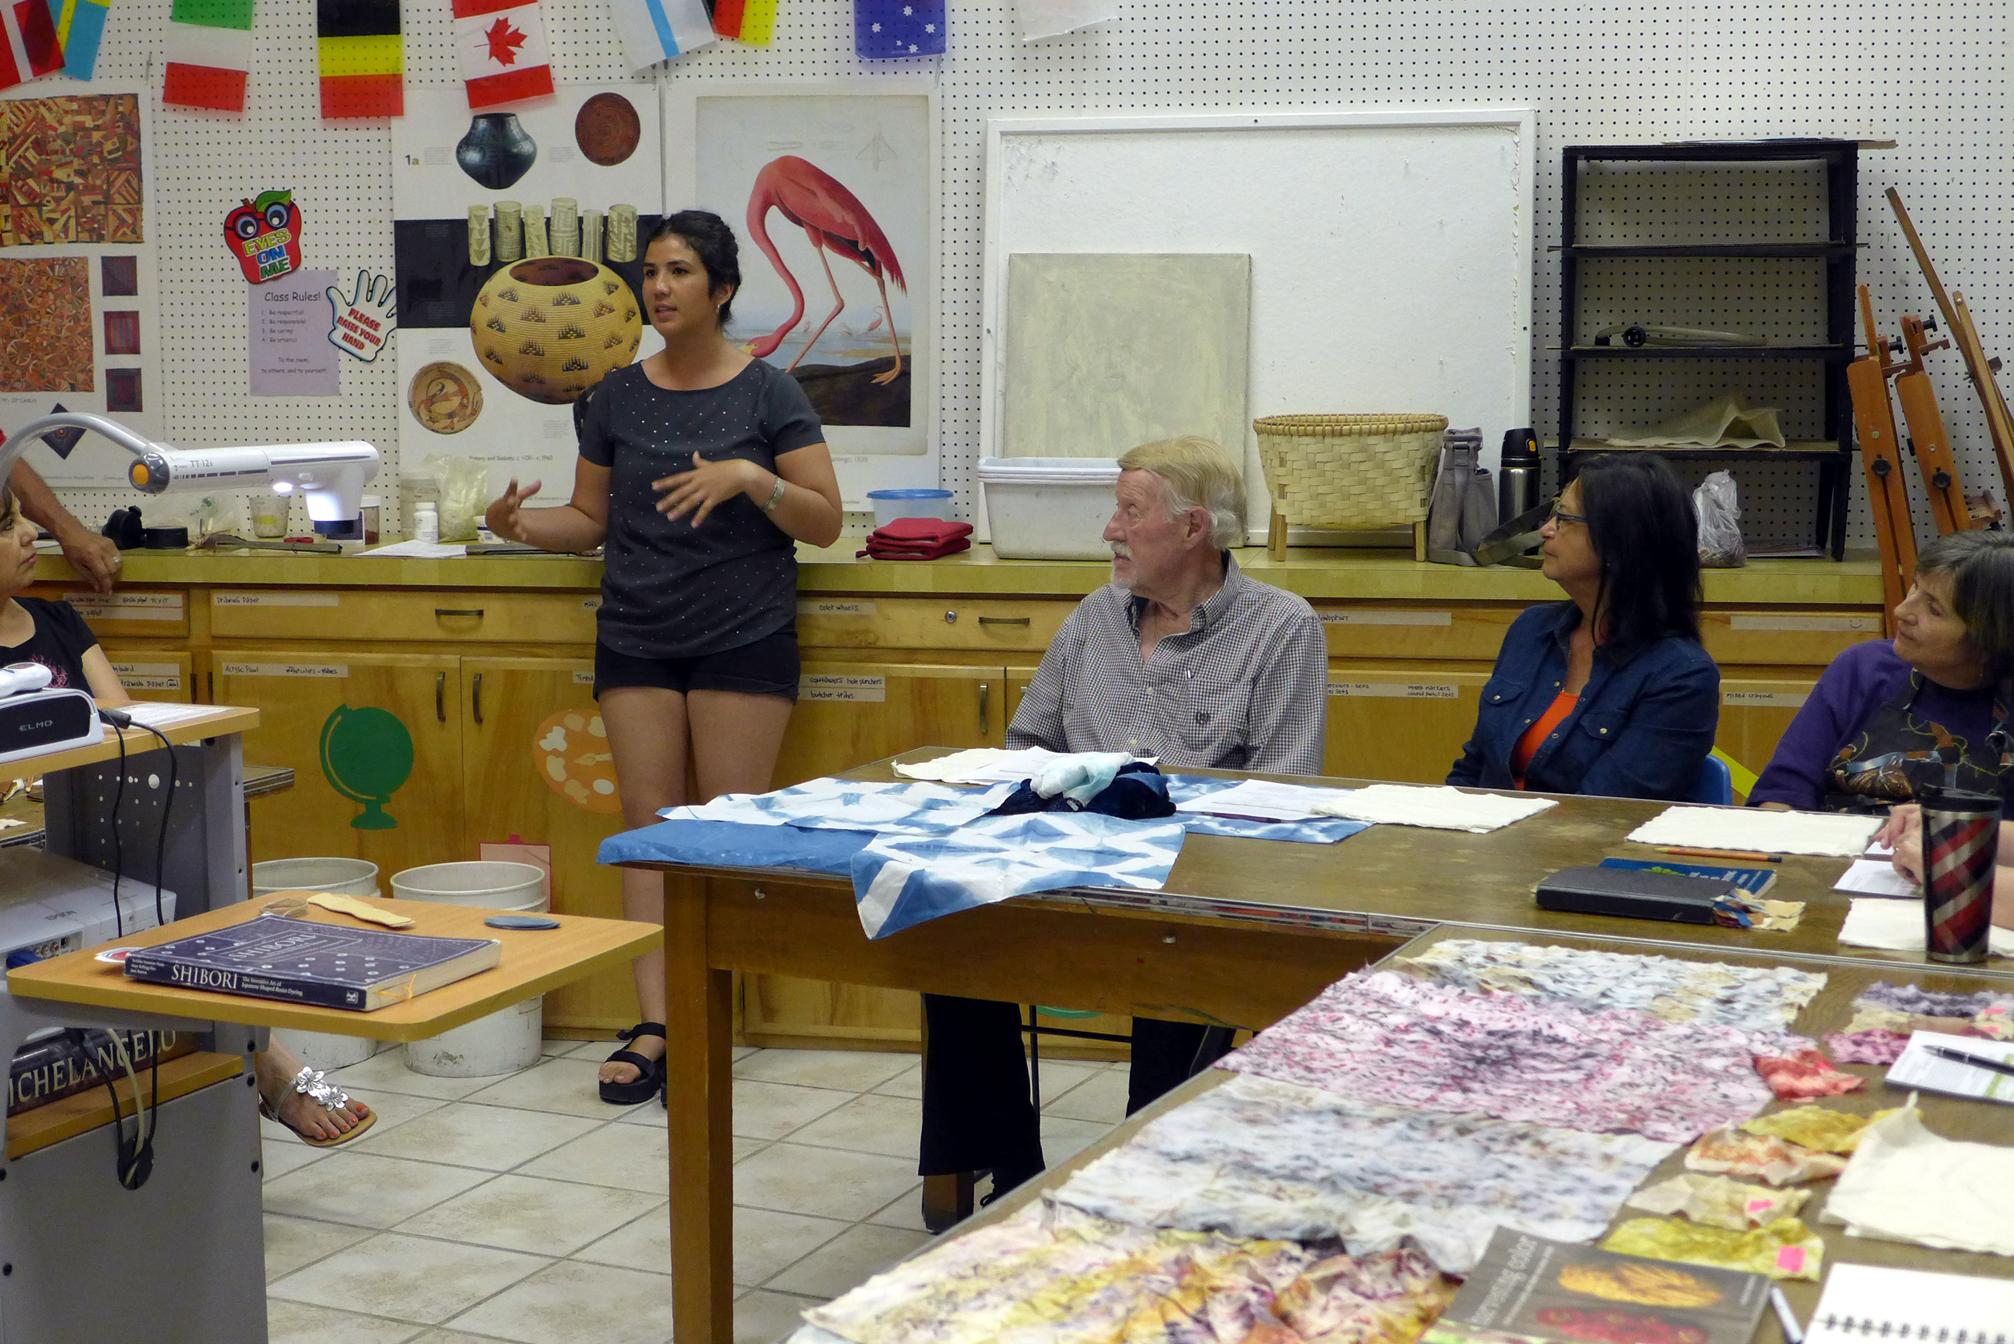 6_Analise Minjarez explains dye baths.jpg